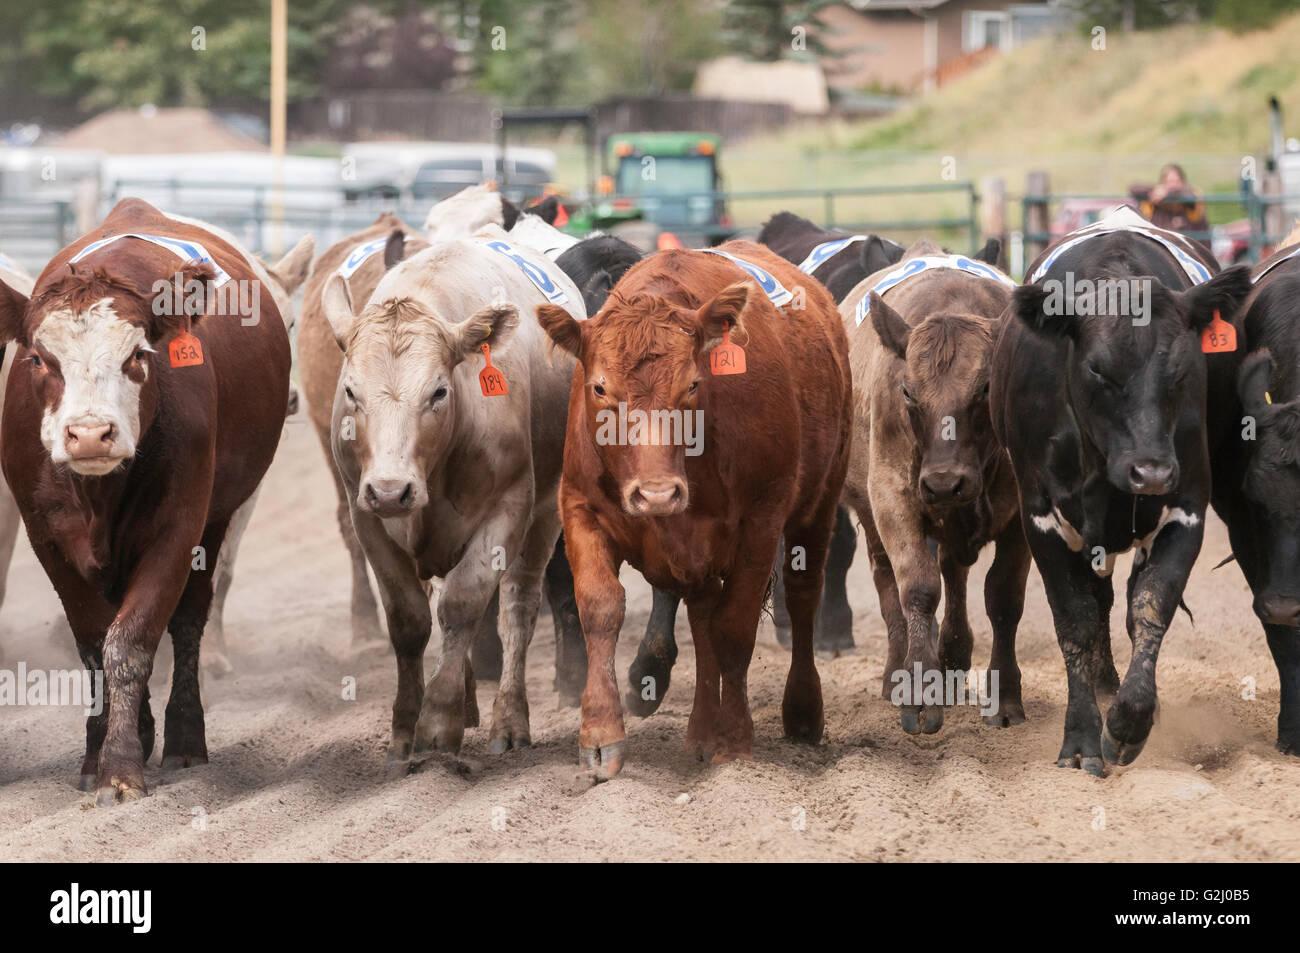 Stock herd, cattle, Cochrane rodeo, Cochrane, Alberta, Canada - Stock Image